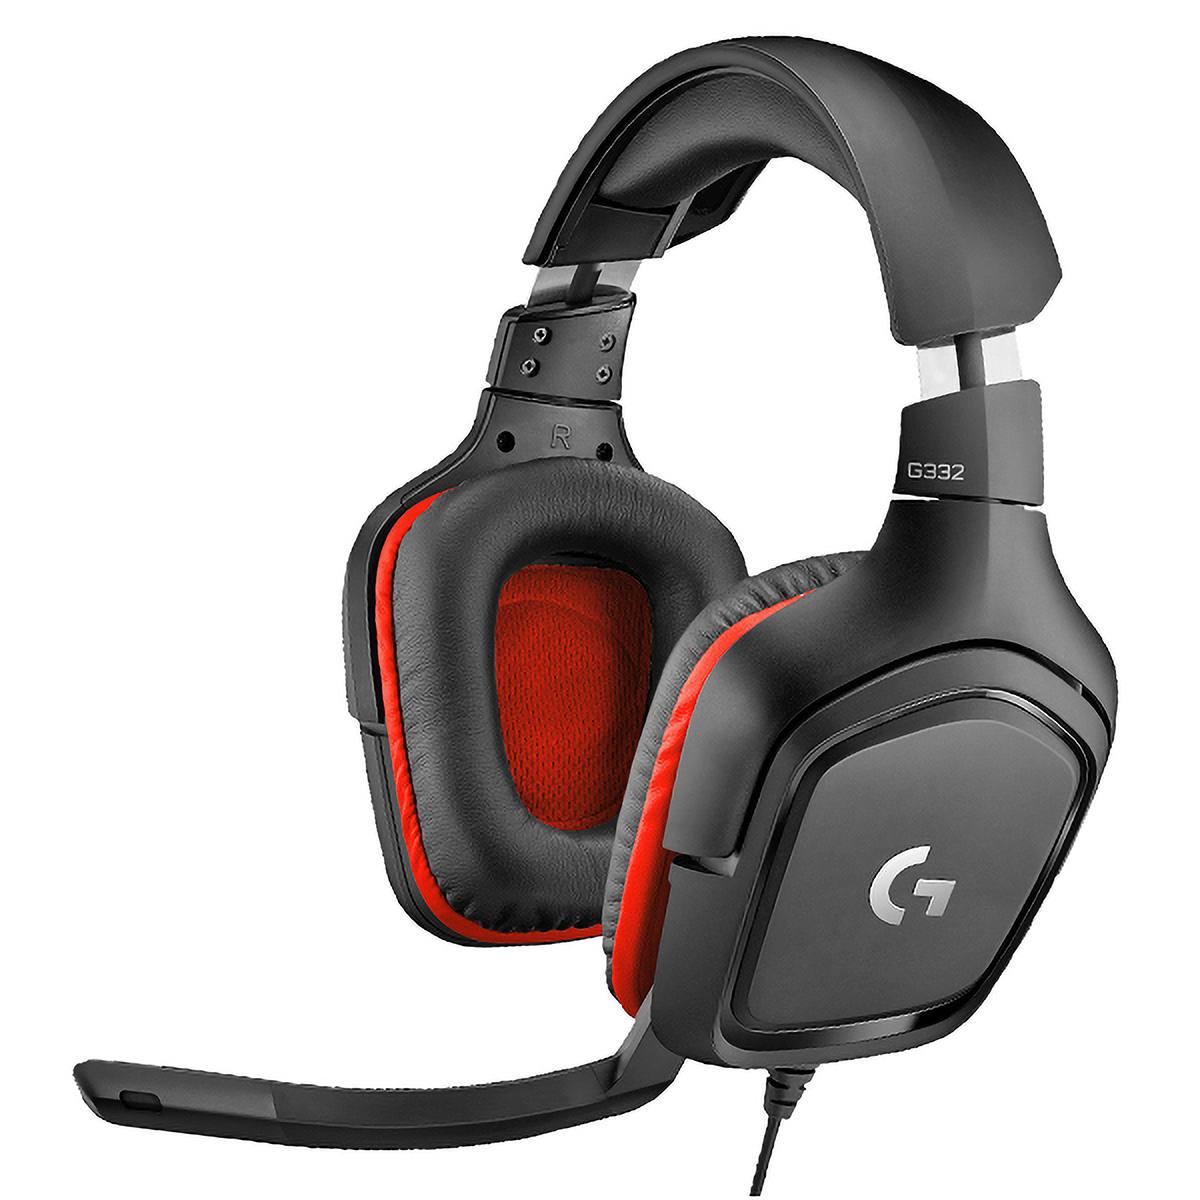 Headset Gamer Logitech G332 Preto/Vermelho Fone Multiplataforma para PC PlayStation Xbox Switch 981-000755